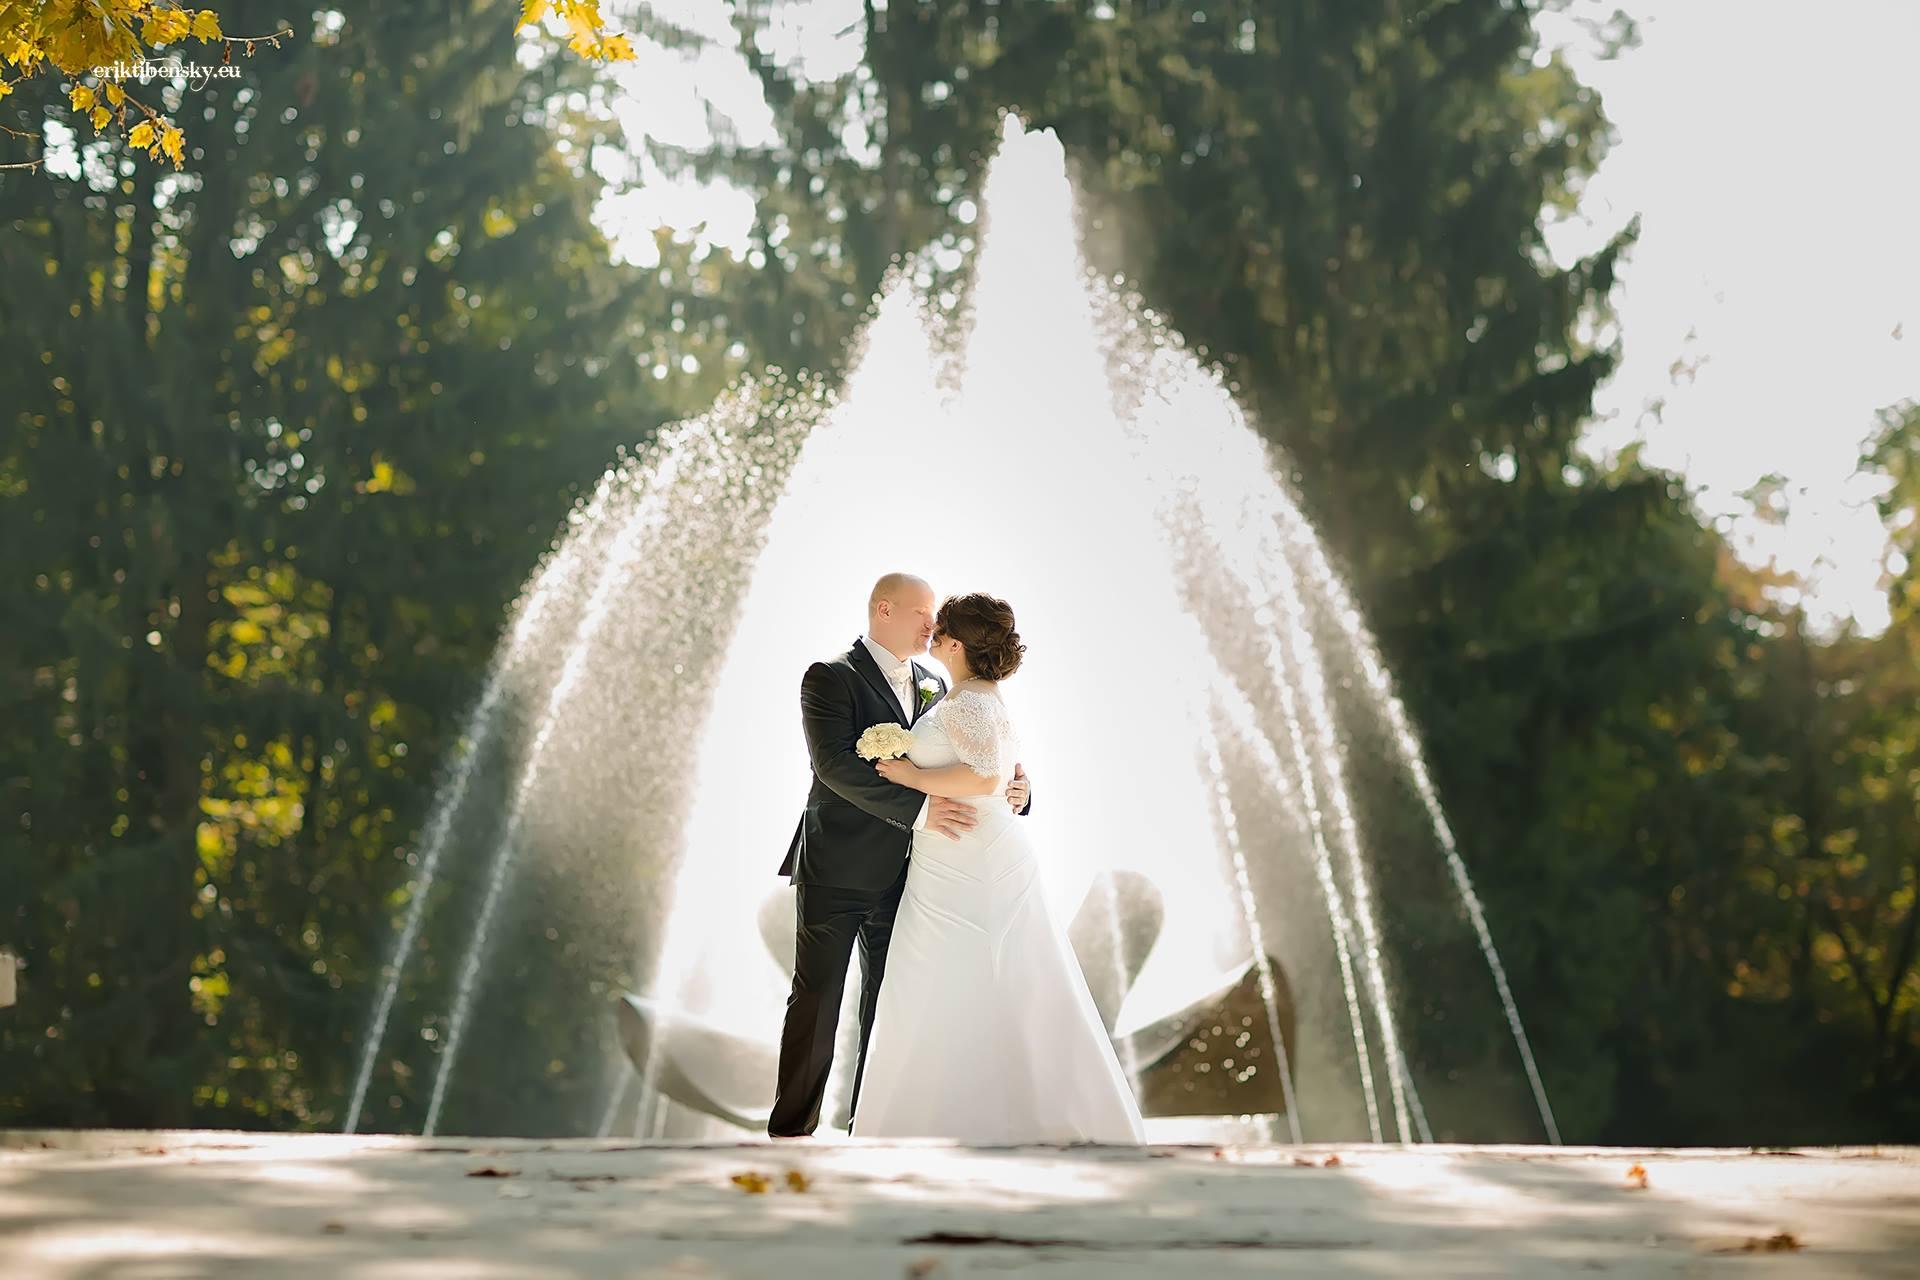 eriktibensky-eu-svadobny-fotograf-wedding-photographer-3105